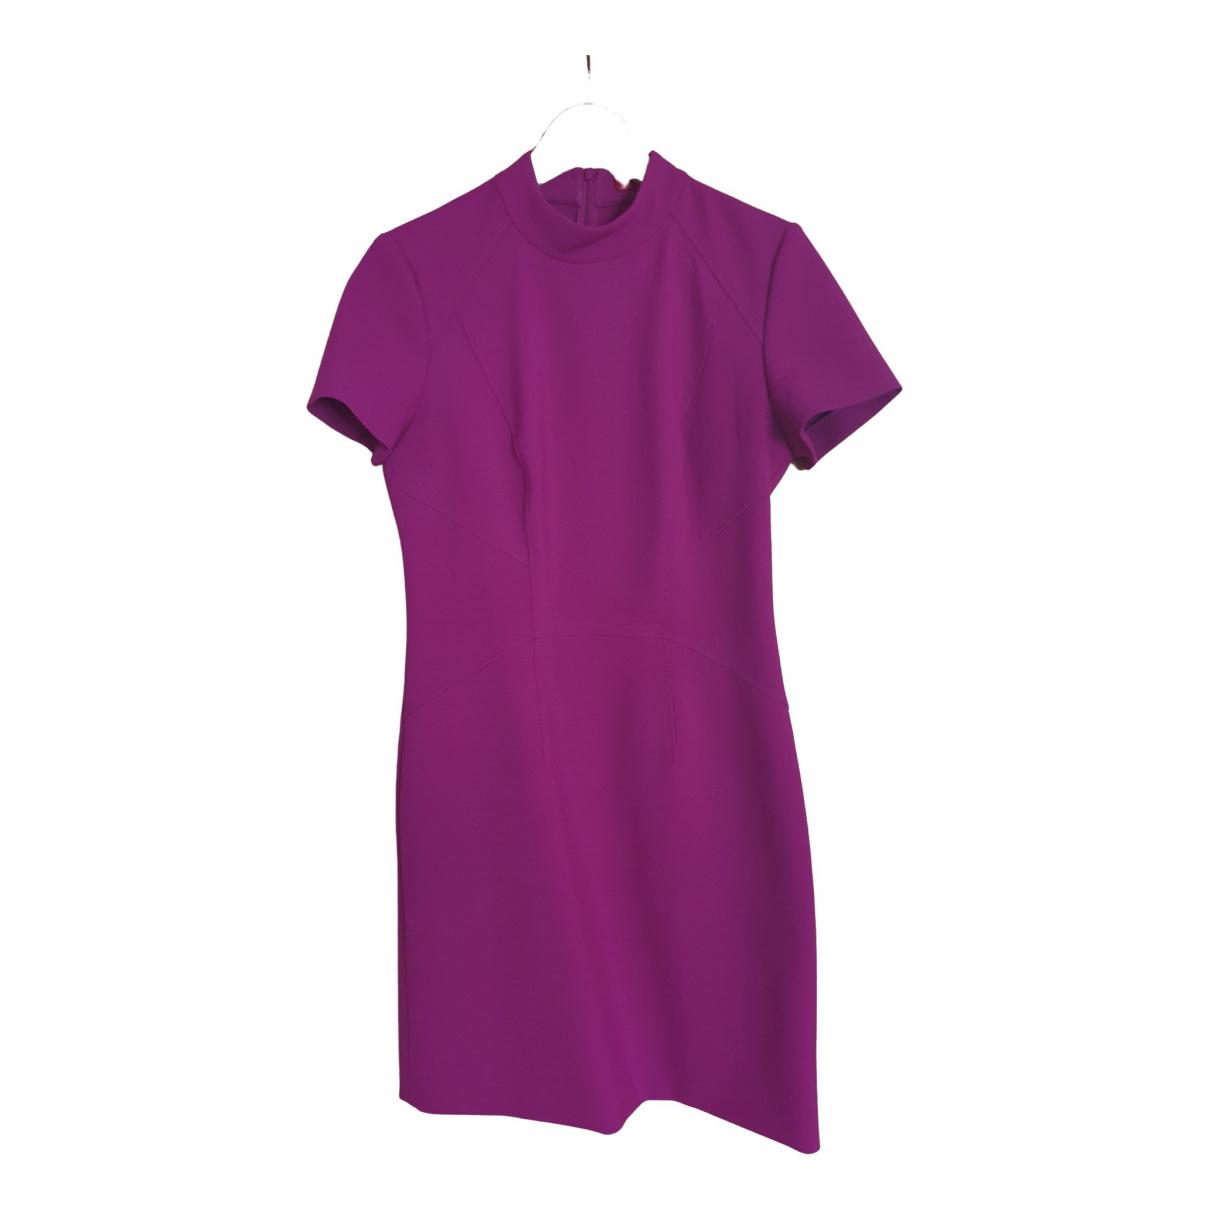 Hugo Boss \N Kleid in  Lila Polyester